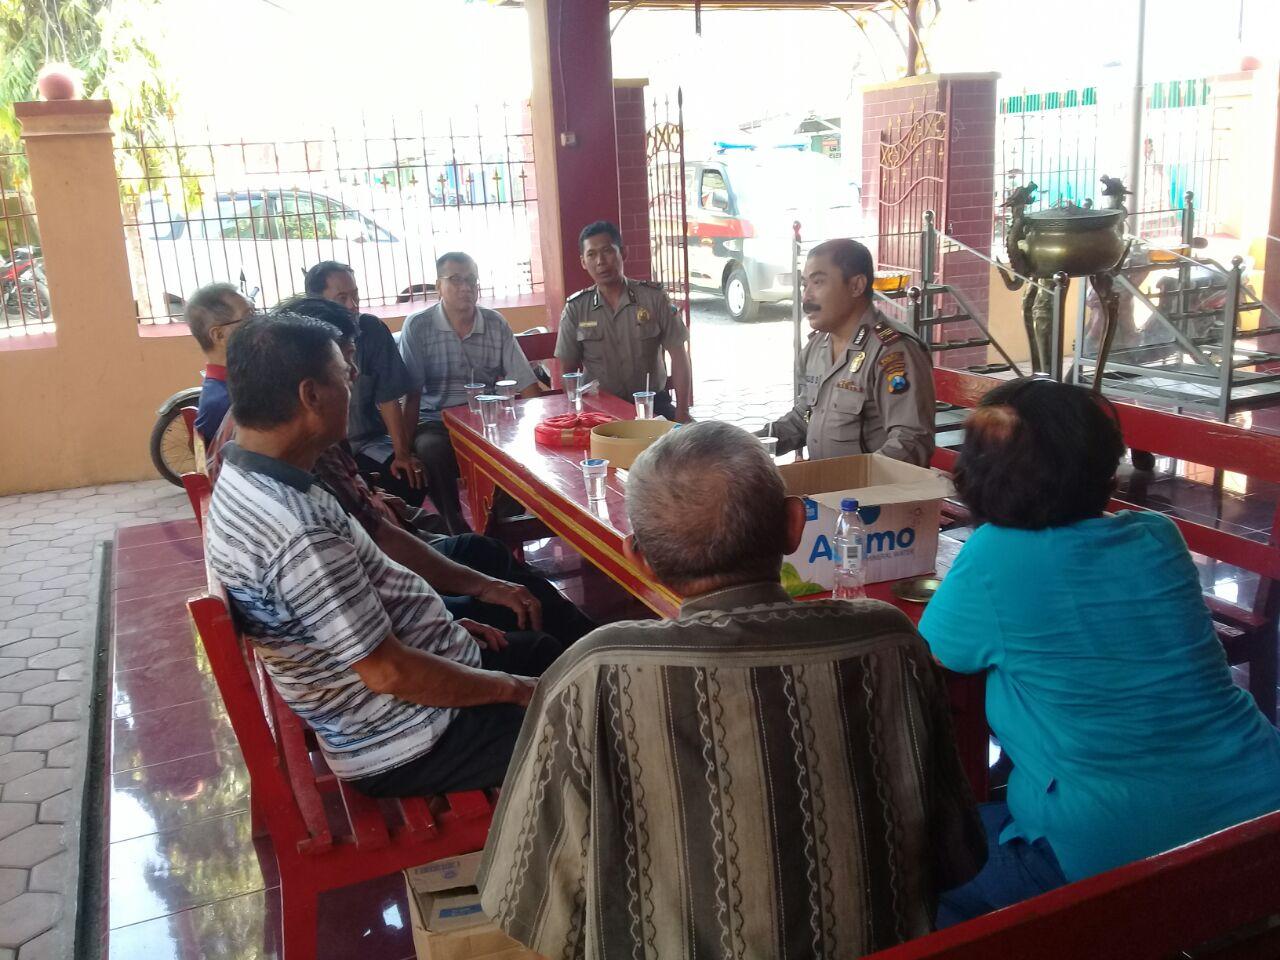 Polda Jatim Berita Kasat Binmas Silaturahmi Kamtibmas Klenteng Poo Tong